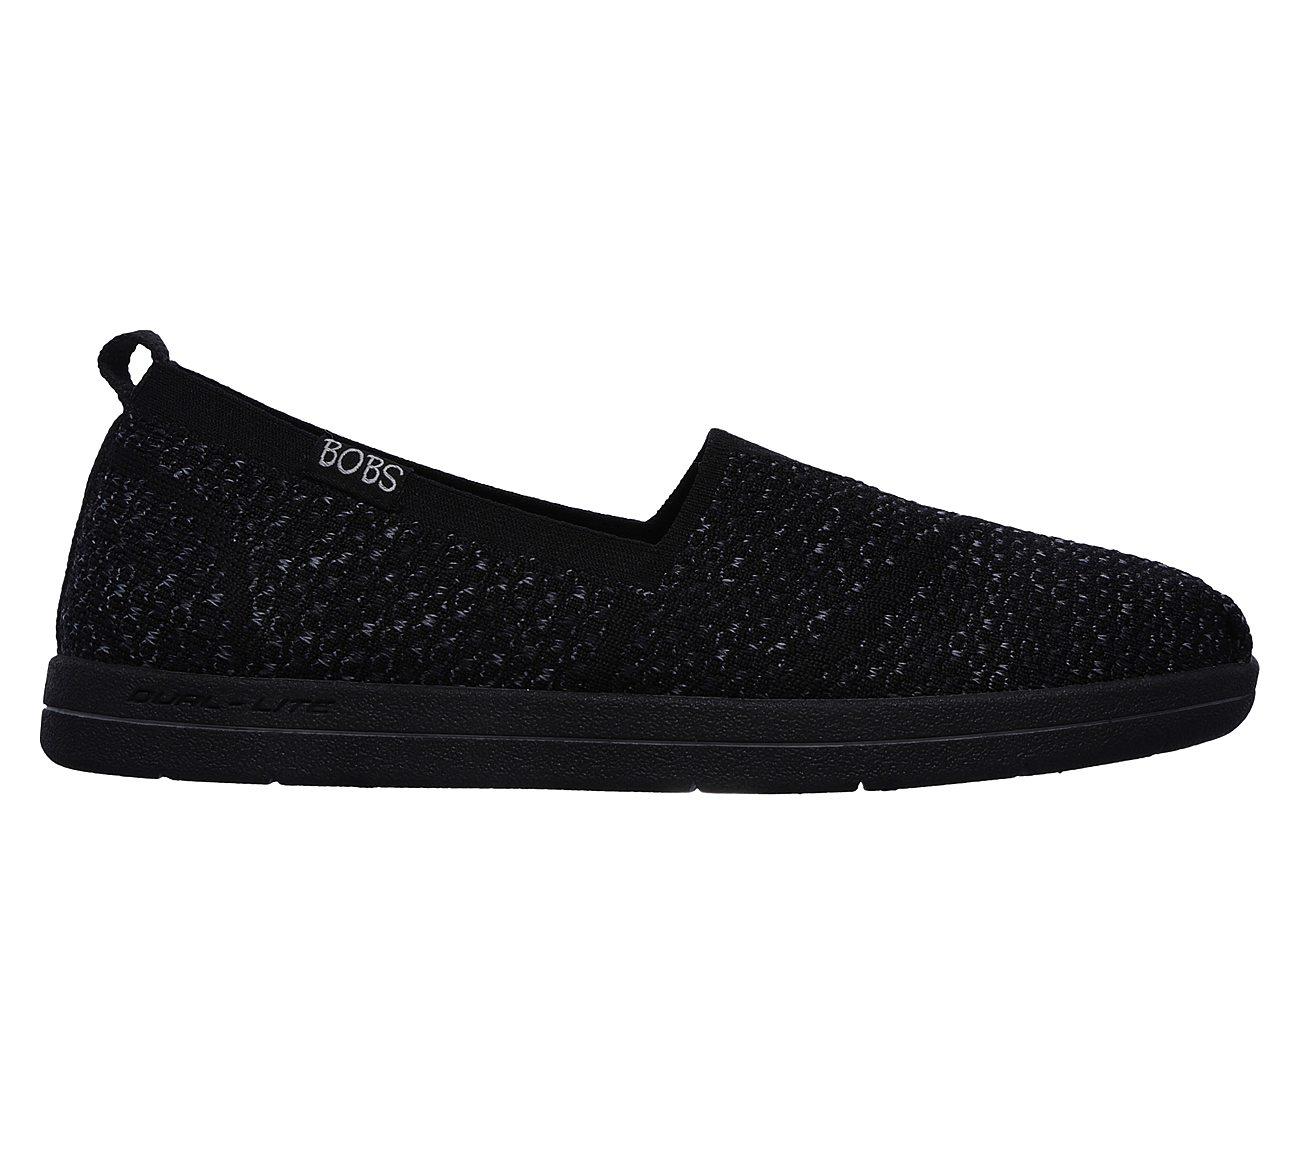 Black Stripe Bobs Super Plush Slip On Shoe Bobs From Skechers